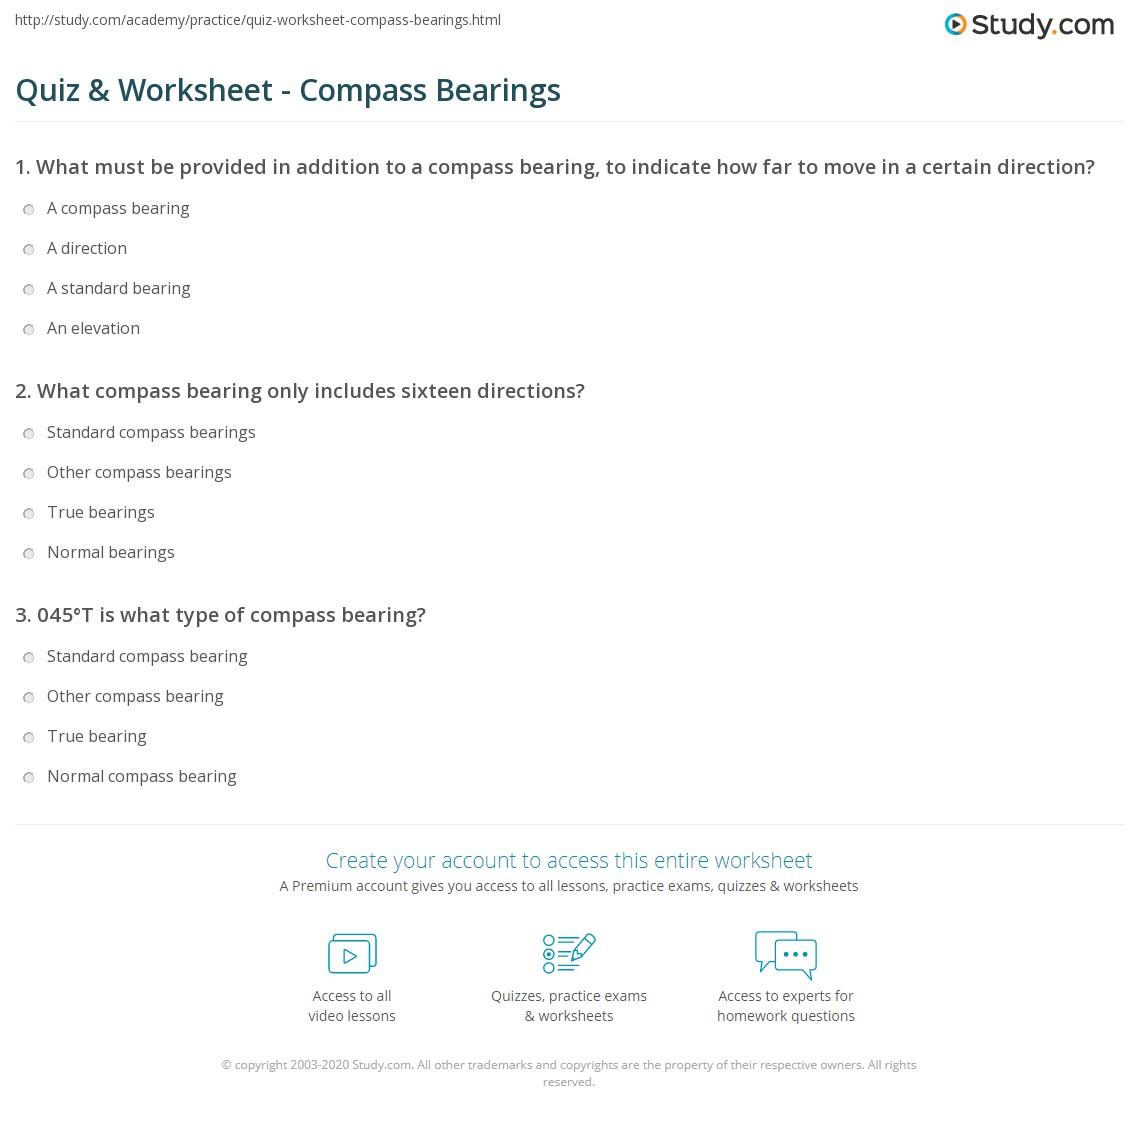 Quiz & Worksheet - Compass Bearings | Study.com